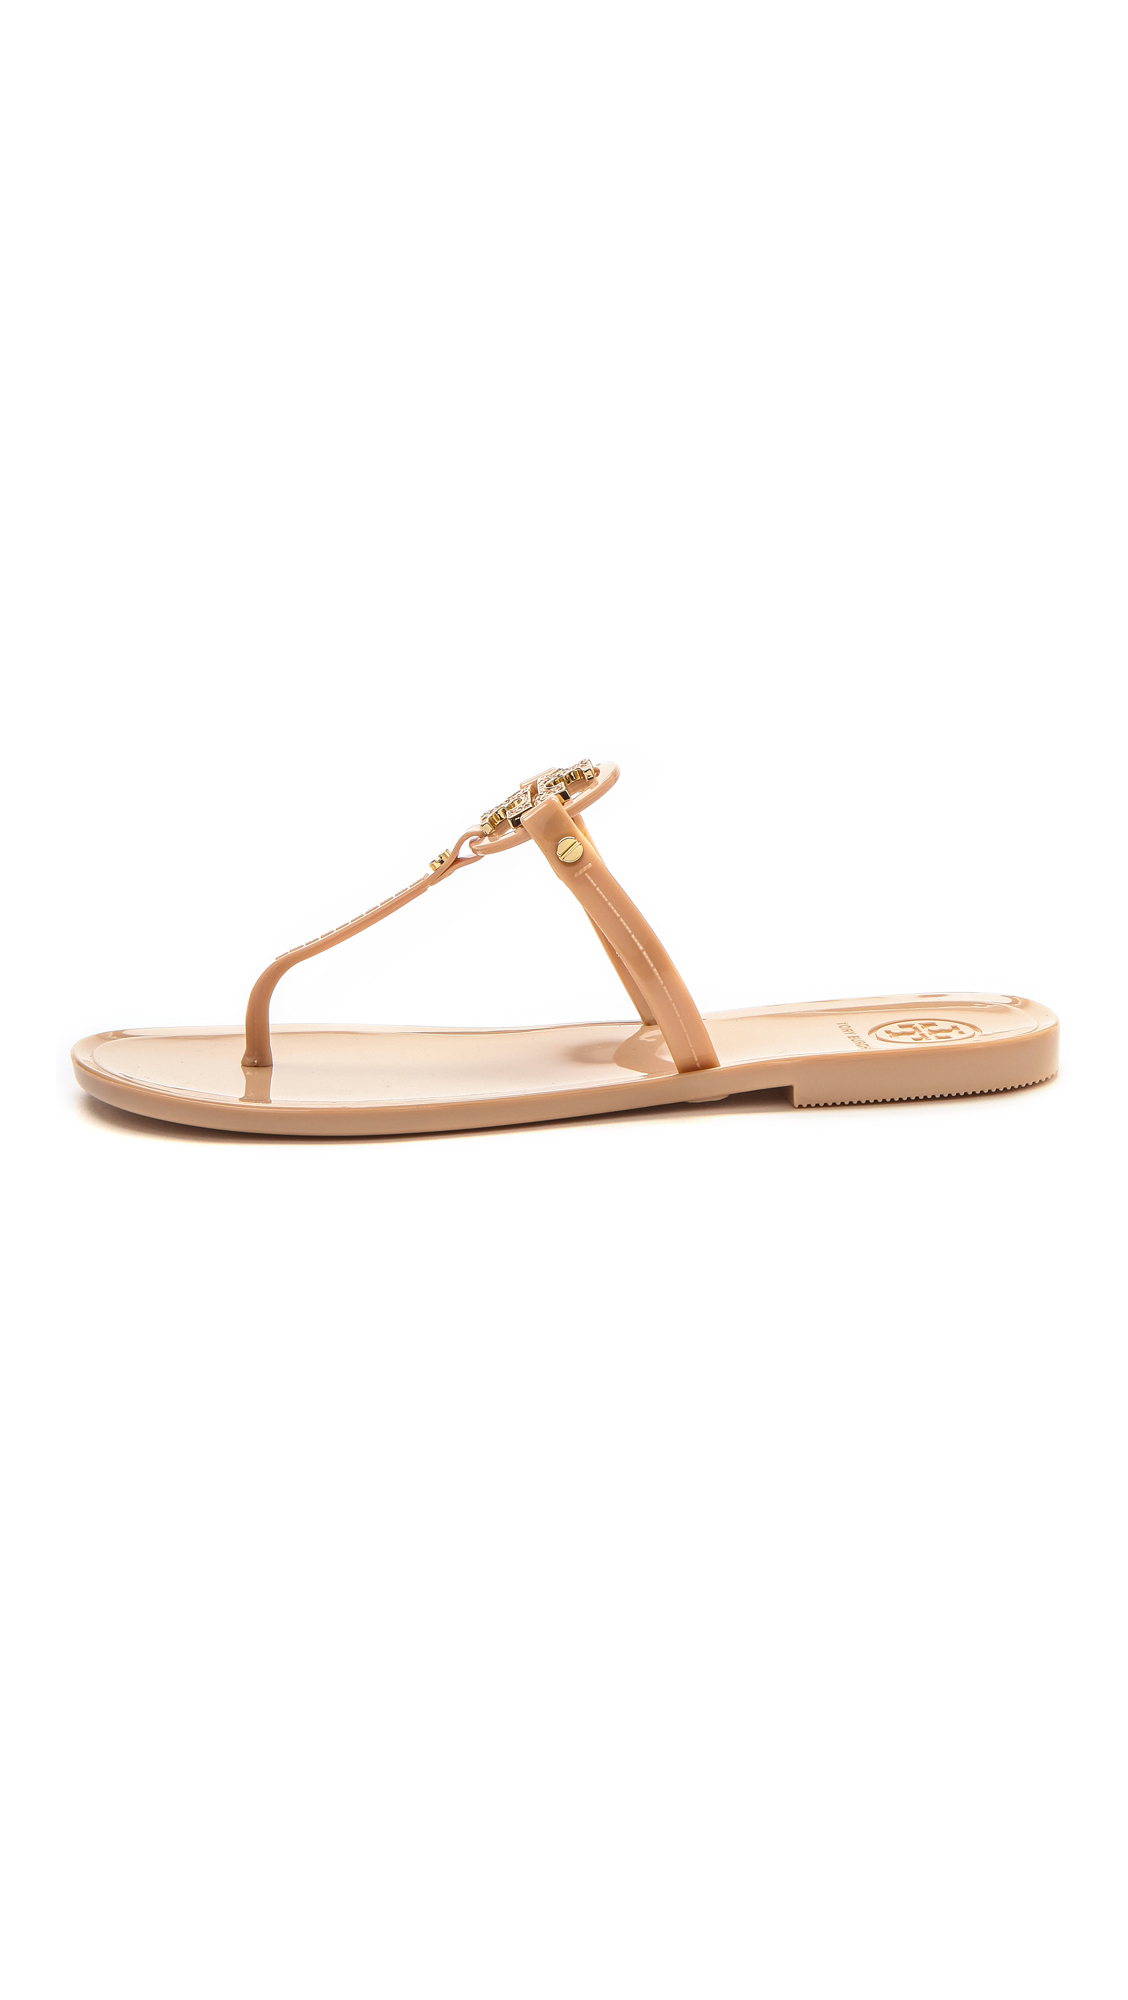 71e374df24d1 Lyst - Tory Burch Mini Miller Flat Thong Sandals - Blush in Pink